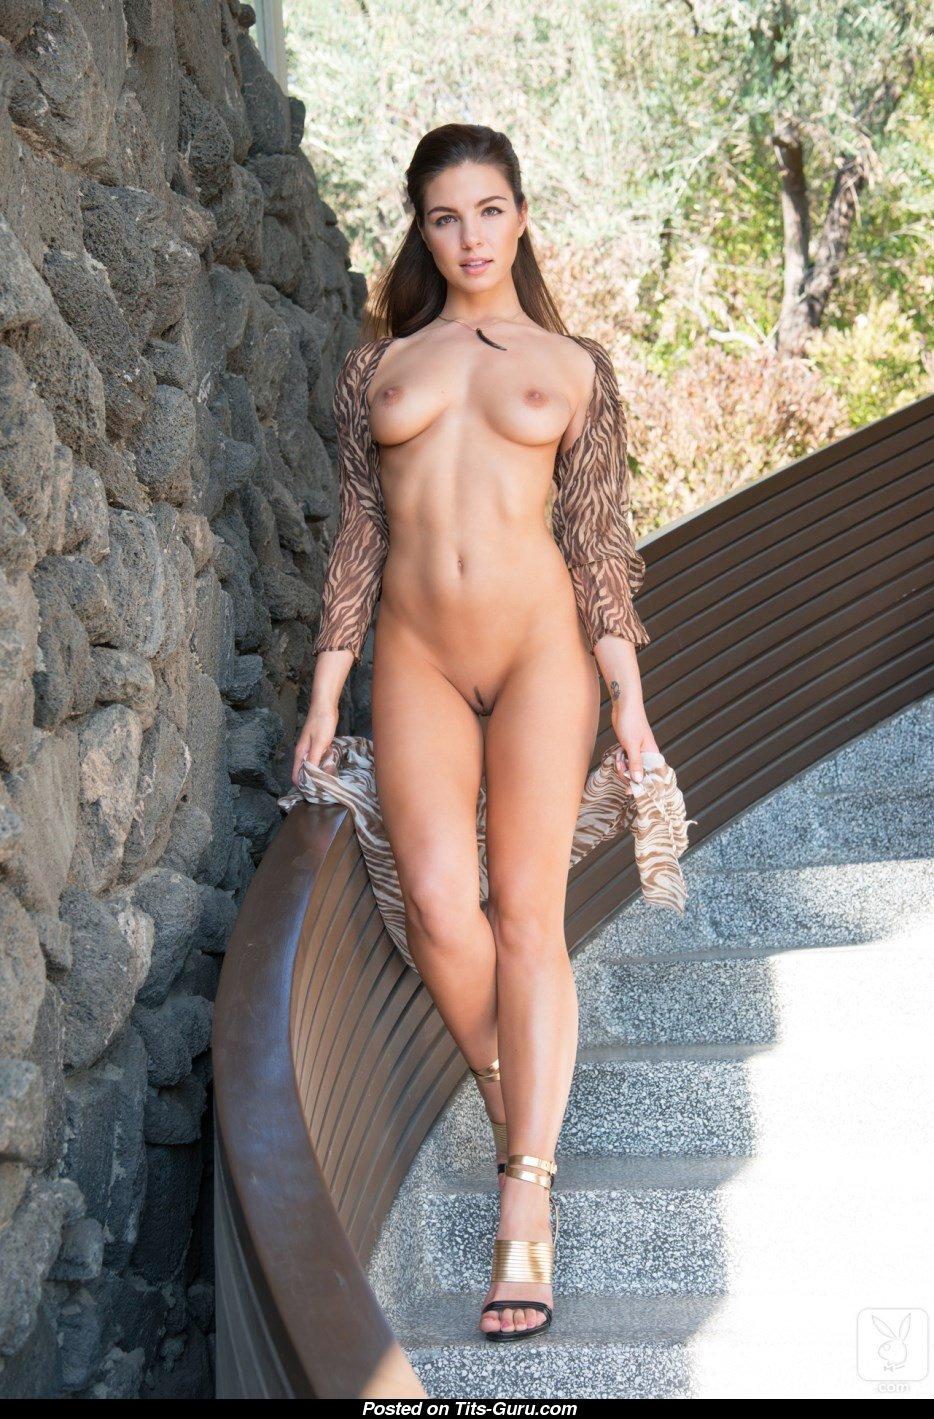 Jessica Ashley Nude Wonderful Woman With Medium Natural -5384